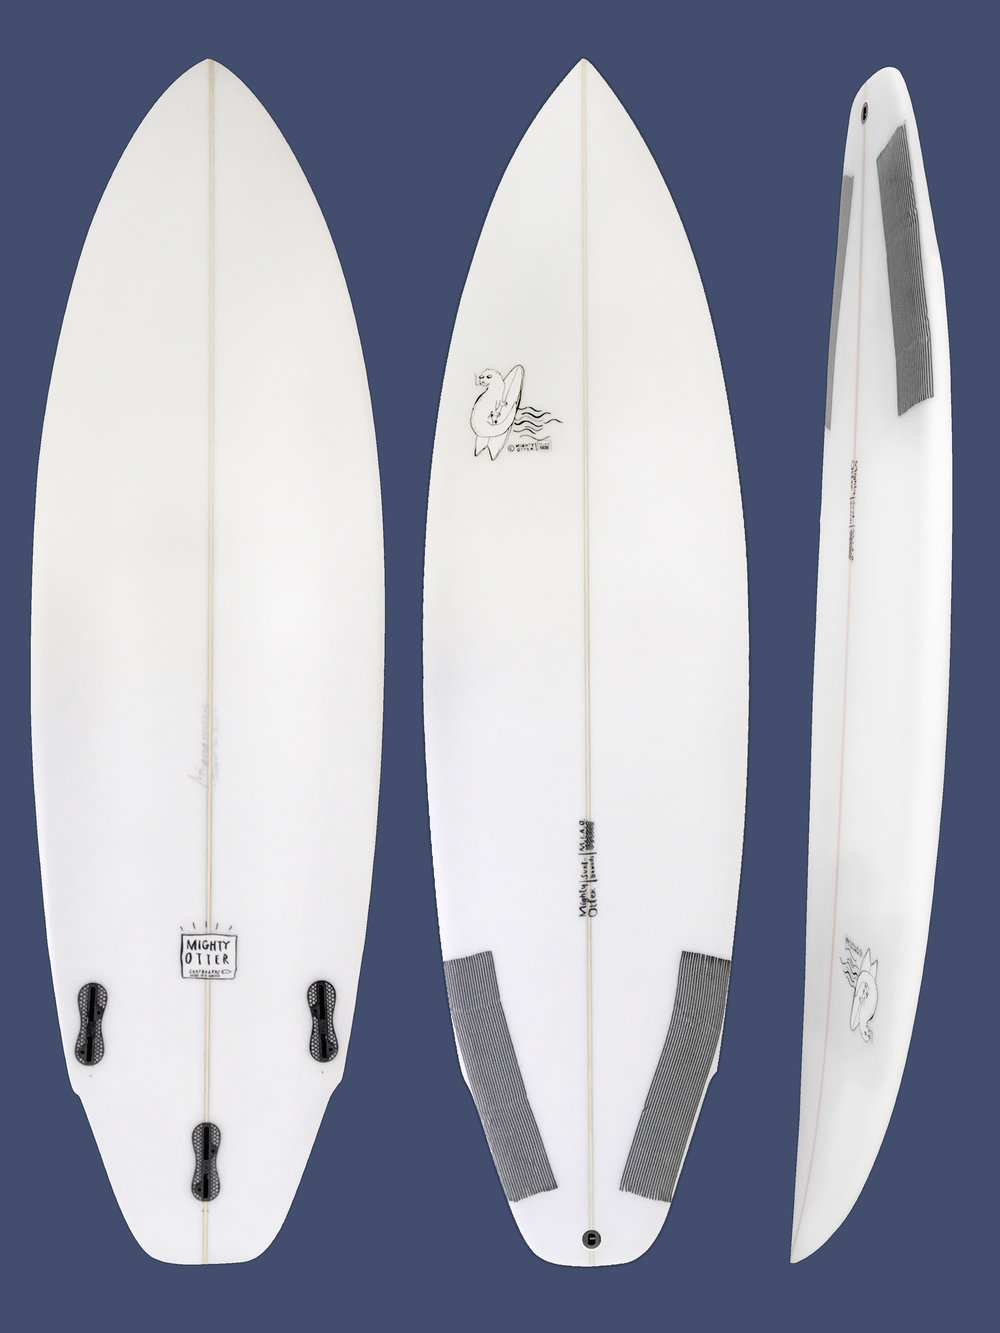 MightyOtterSurfboards_Snapper_Lukas_Brunner_SupportTheLove.jpg